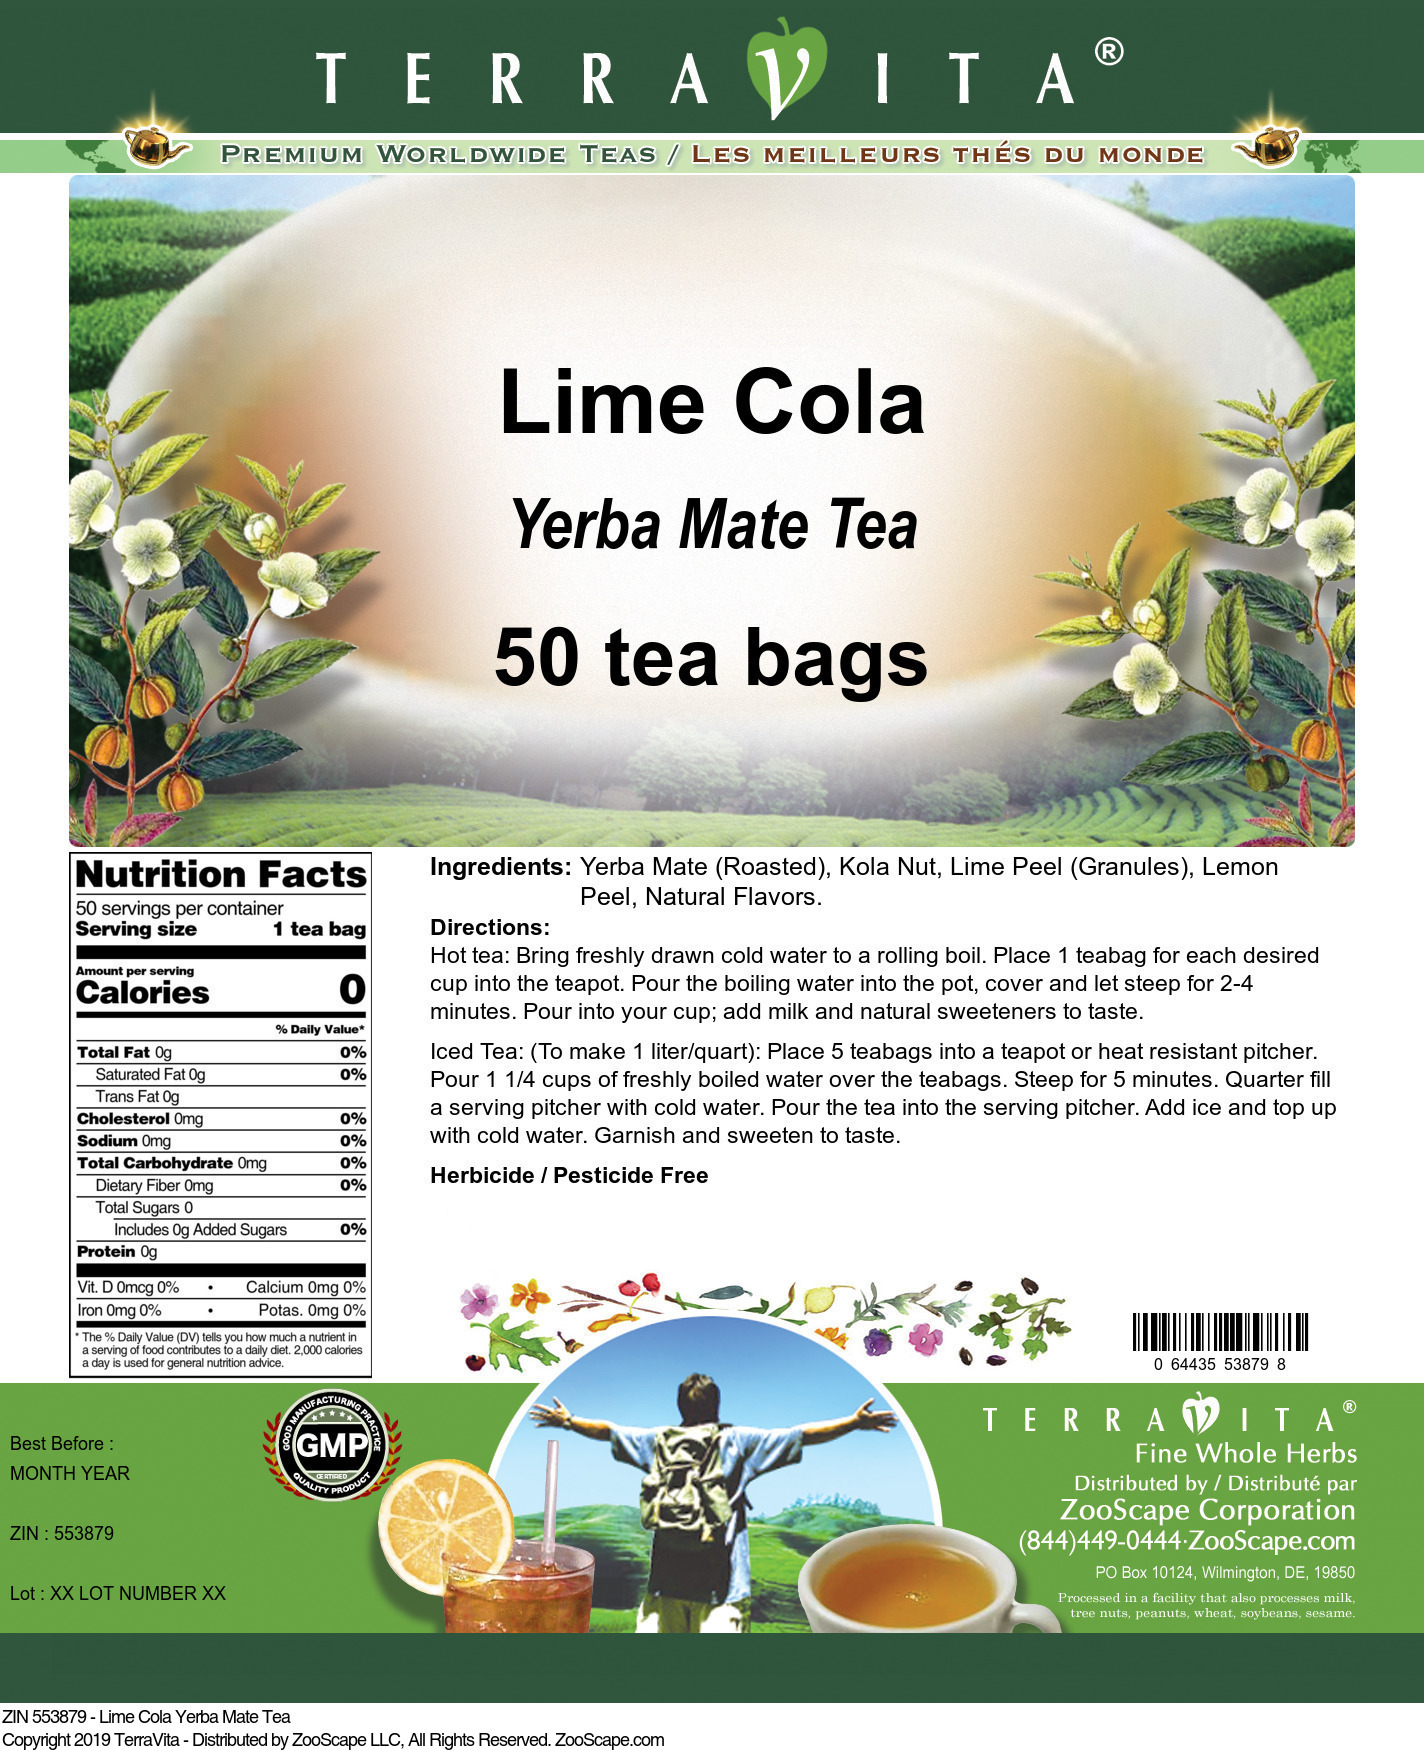 Lime Cola Yerba Mate